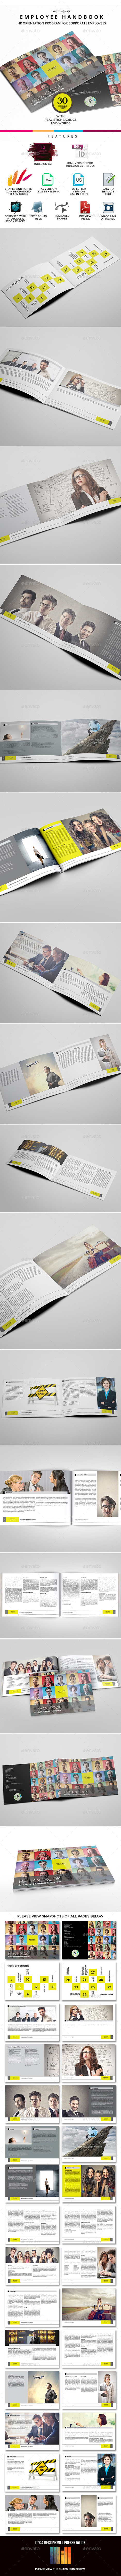 Employee/HR Handbook - Miscellaneous Print Templates